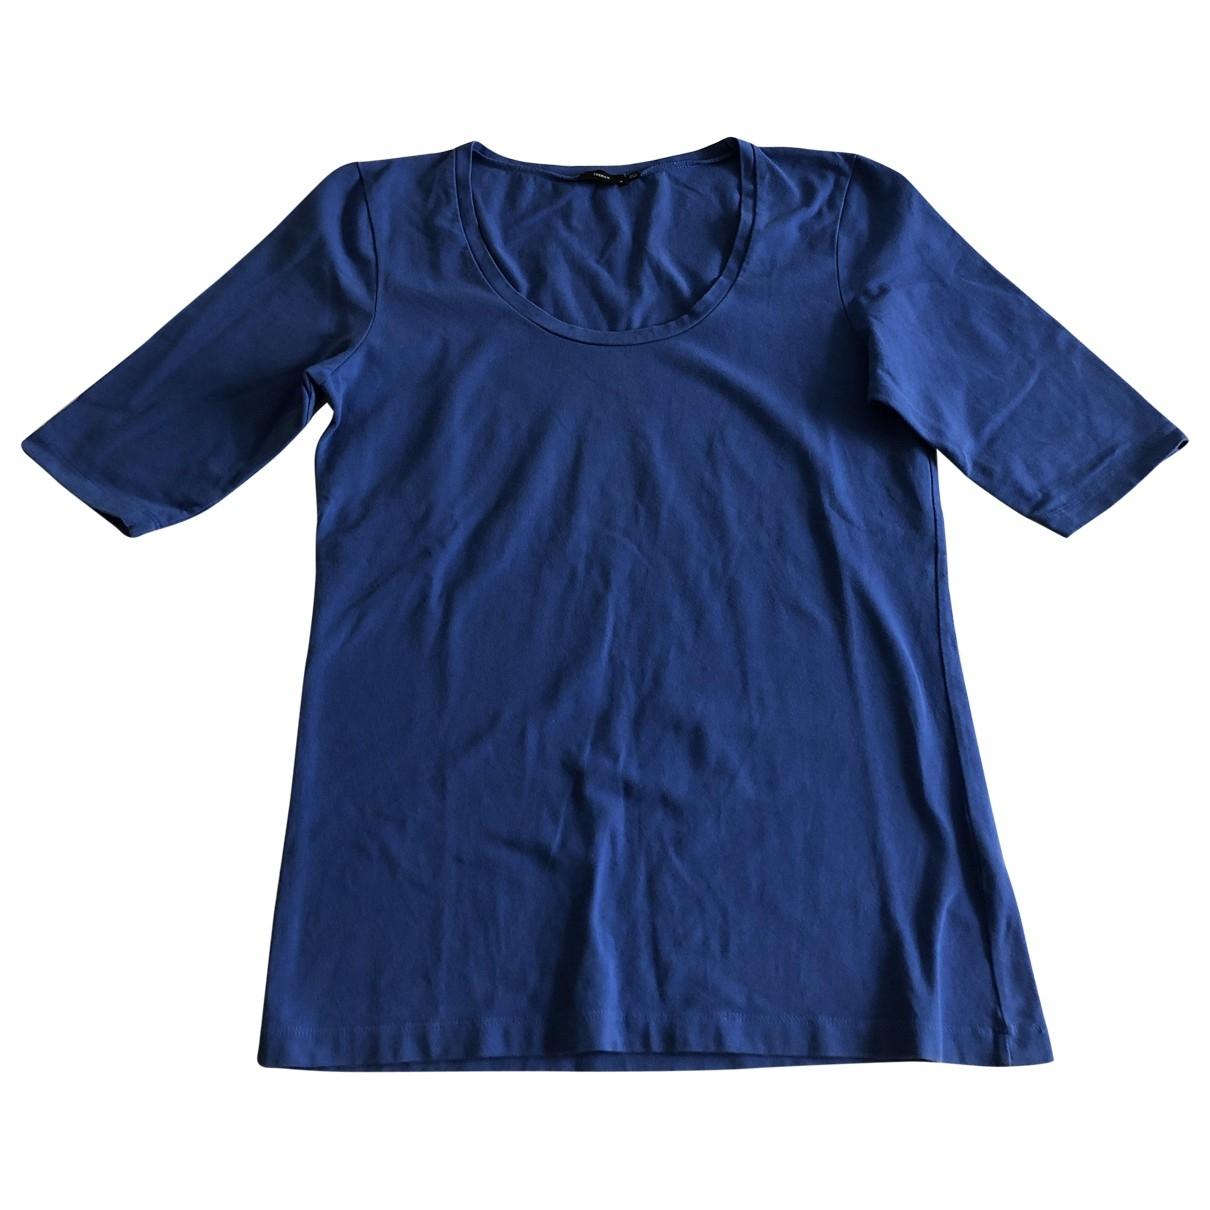 Filippa K \N Blue Cotton  top for Women M International